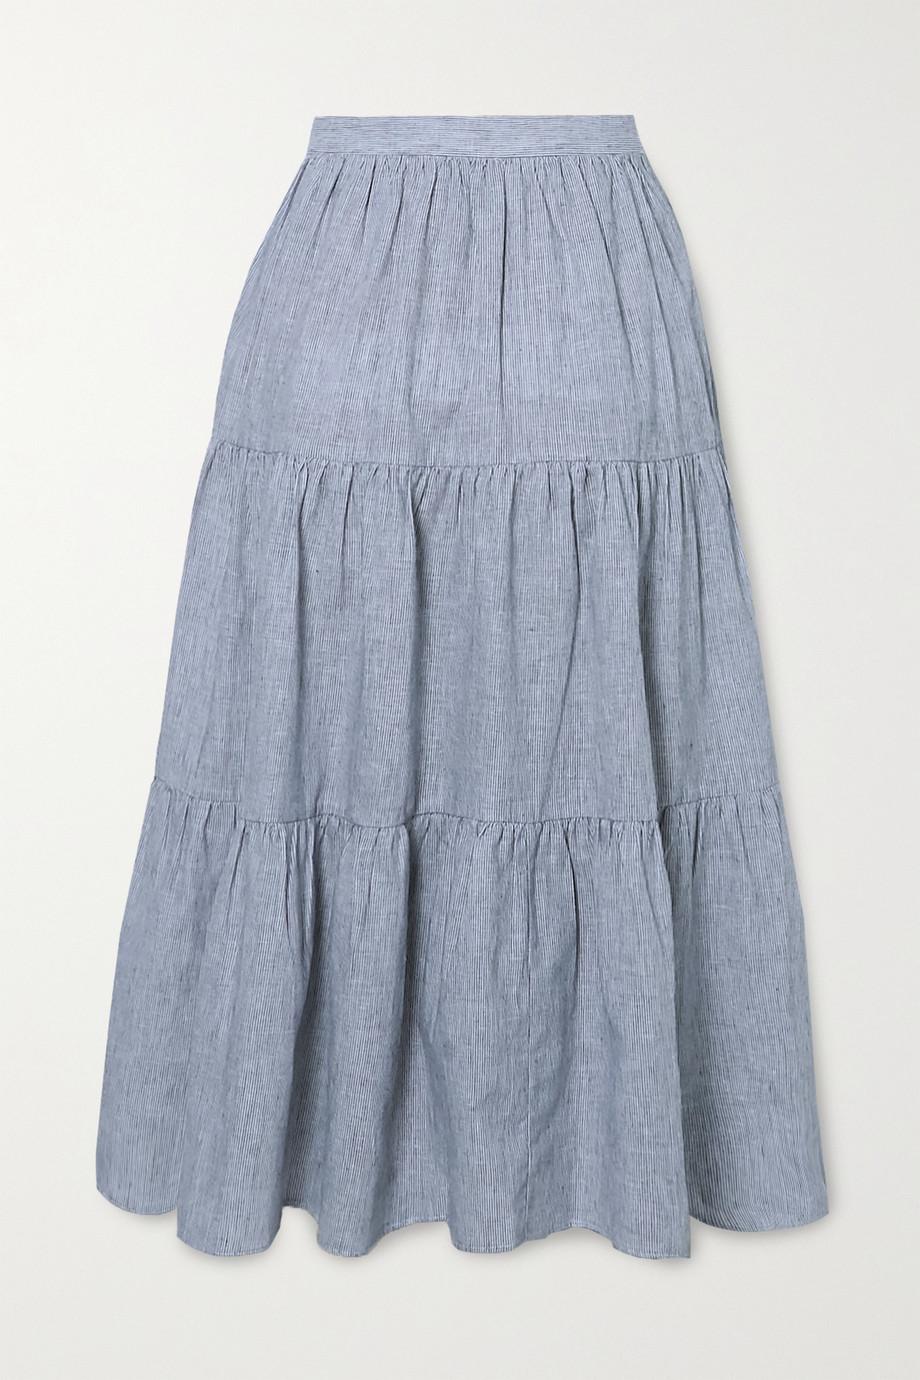 MICHAEL Michael Kors Tiered striped linen and cotton-blend midi skirt